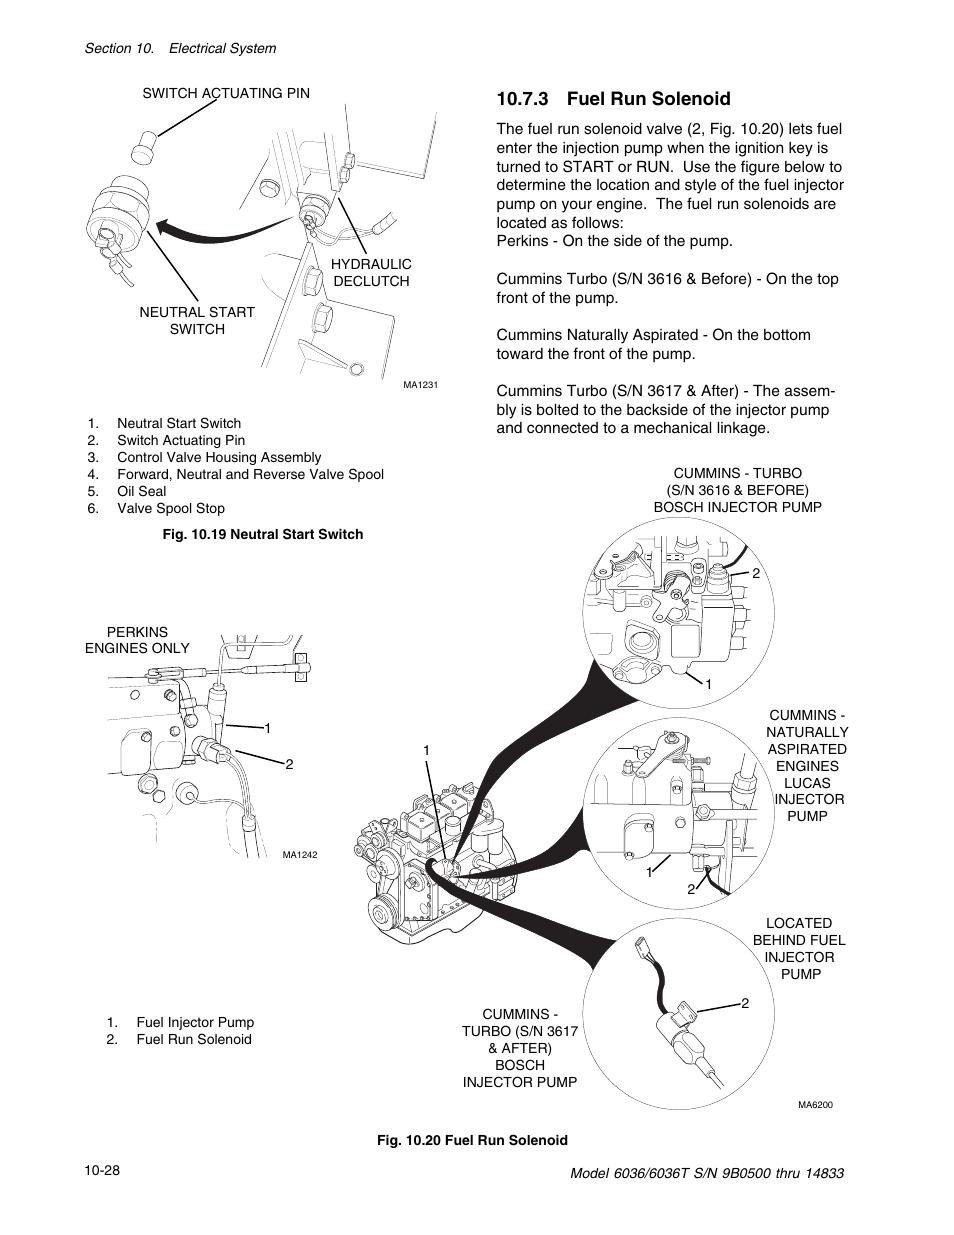 hight resolution of 3 fuel run solenoid skytrak 6036 service manual user manual page 290 342